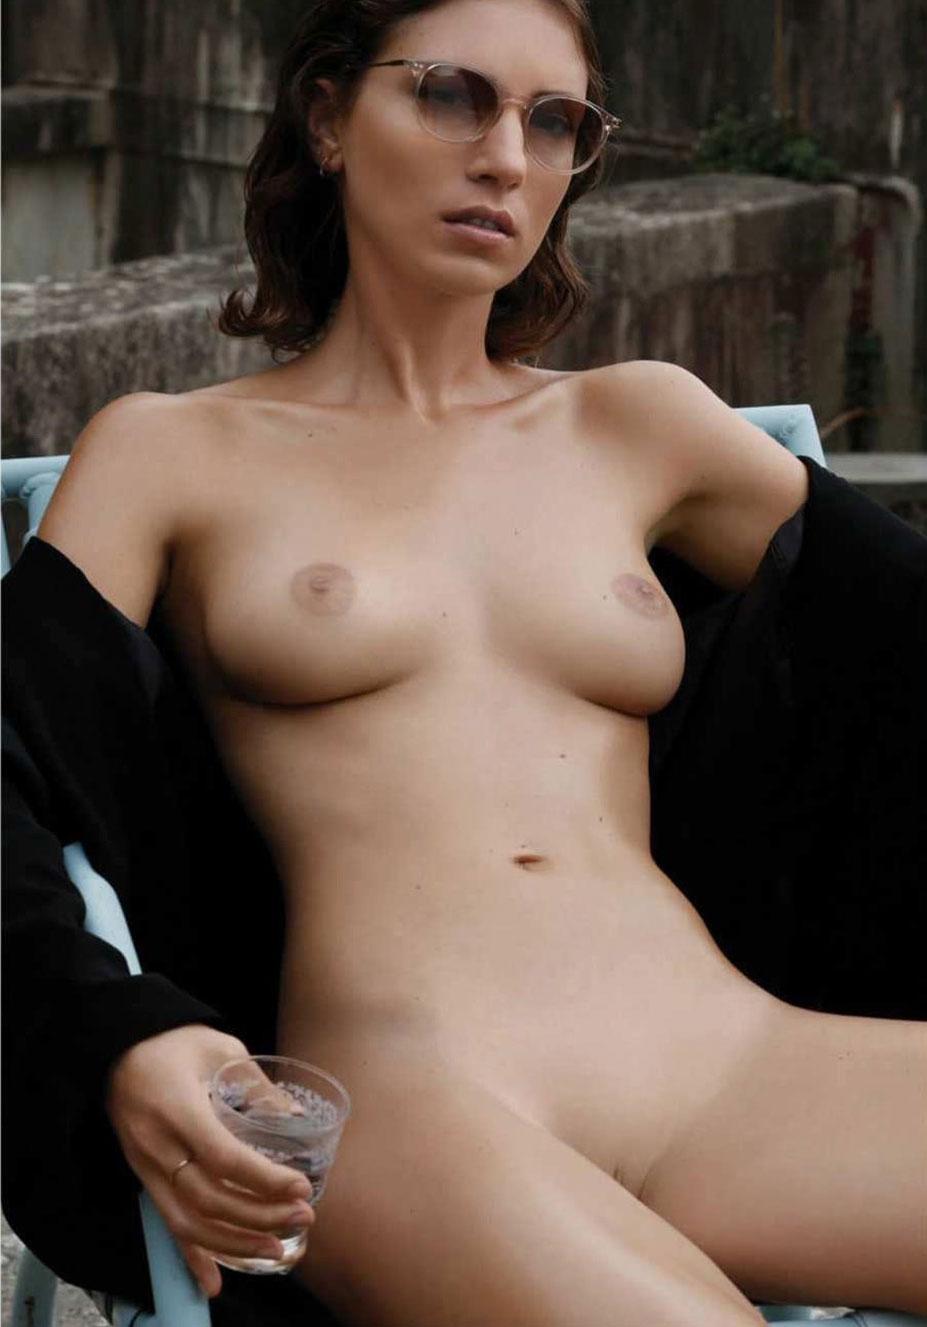 Голая девушка с собакой / Melanie Nizette / Miluniel nude by Henryk Lobaczewski